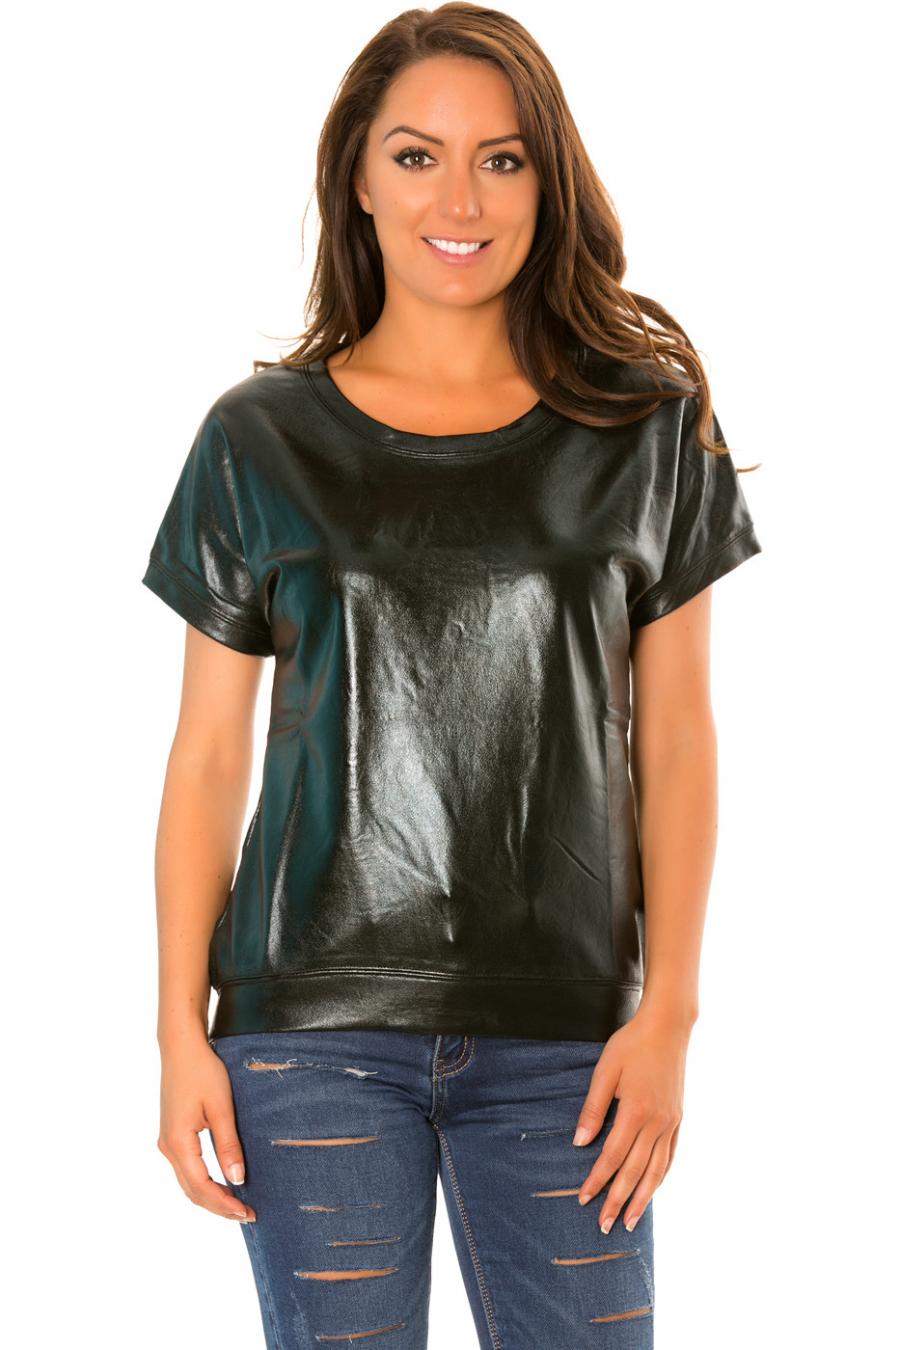 Black shiny retro style short-sleeved sweater. WJ-3872